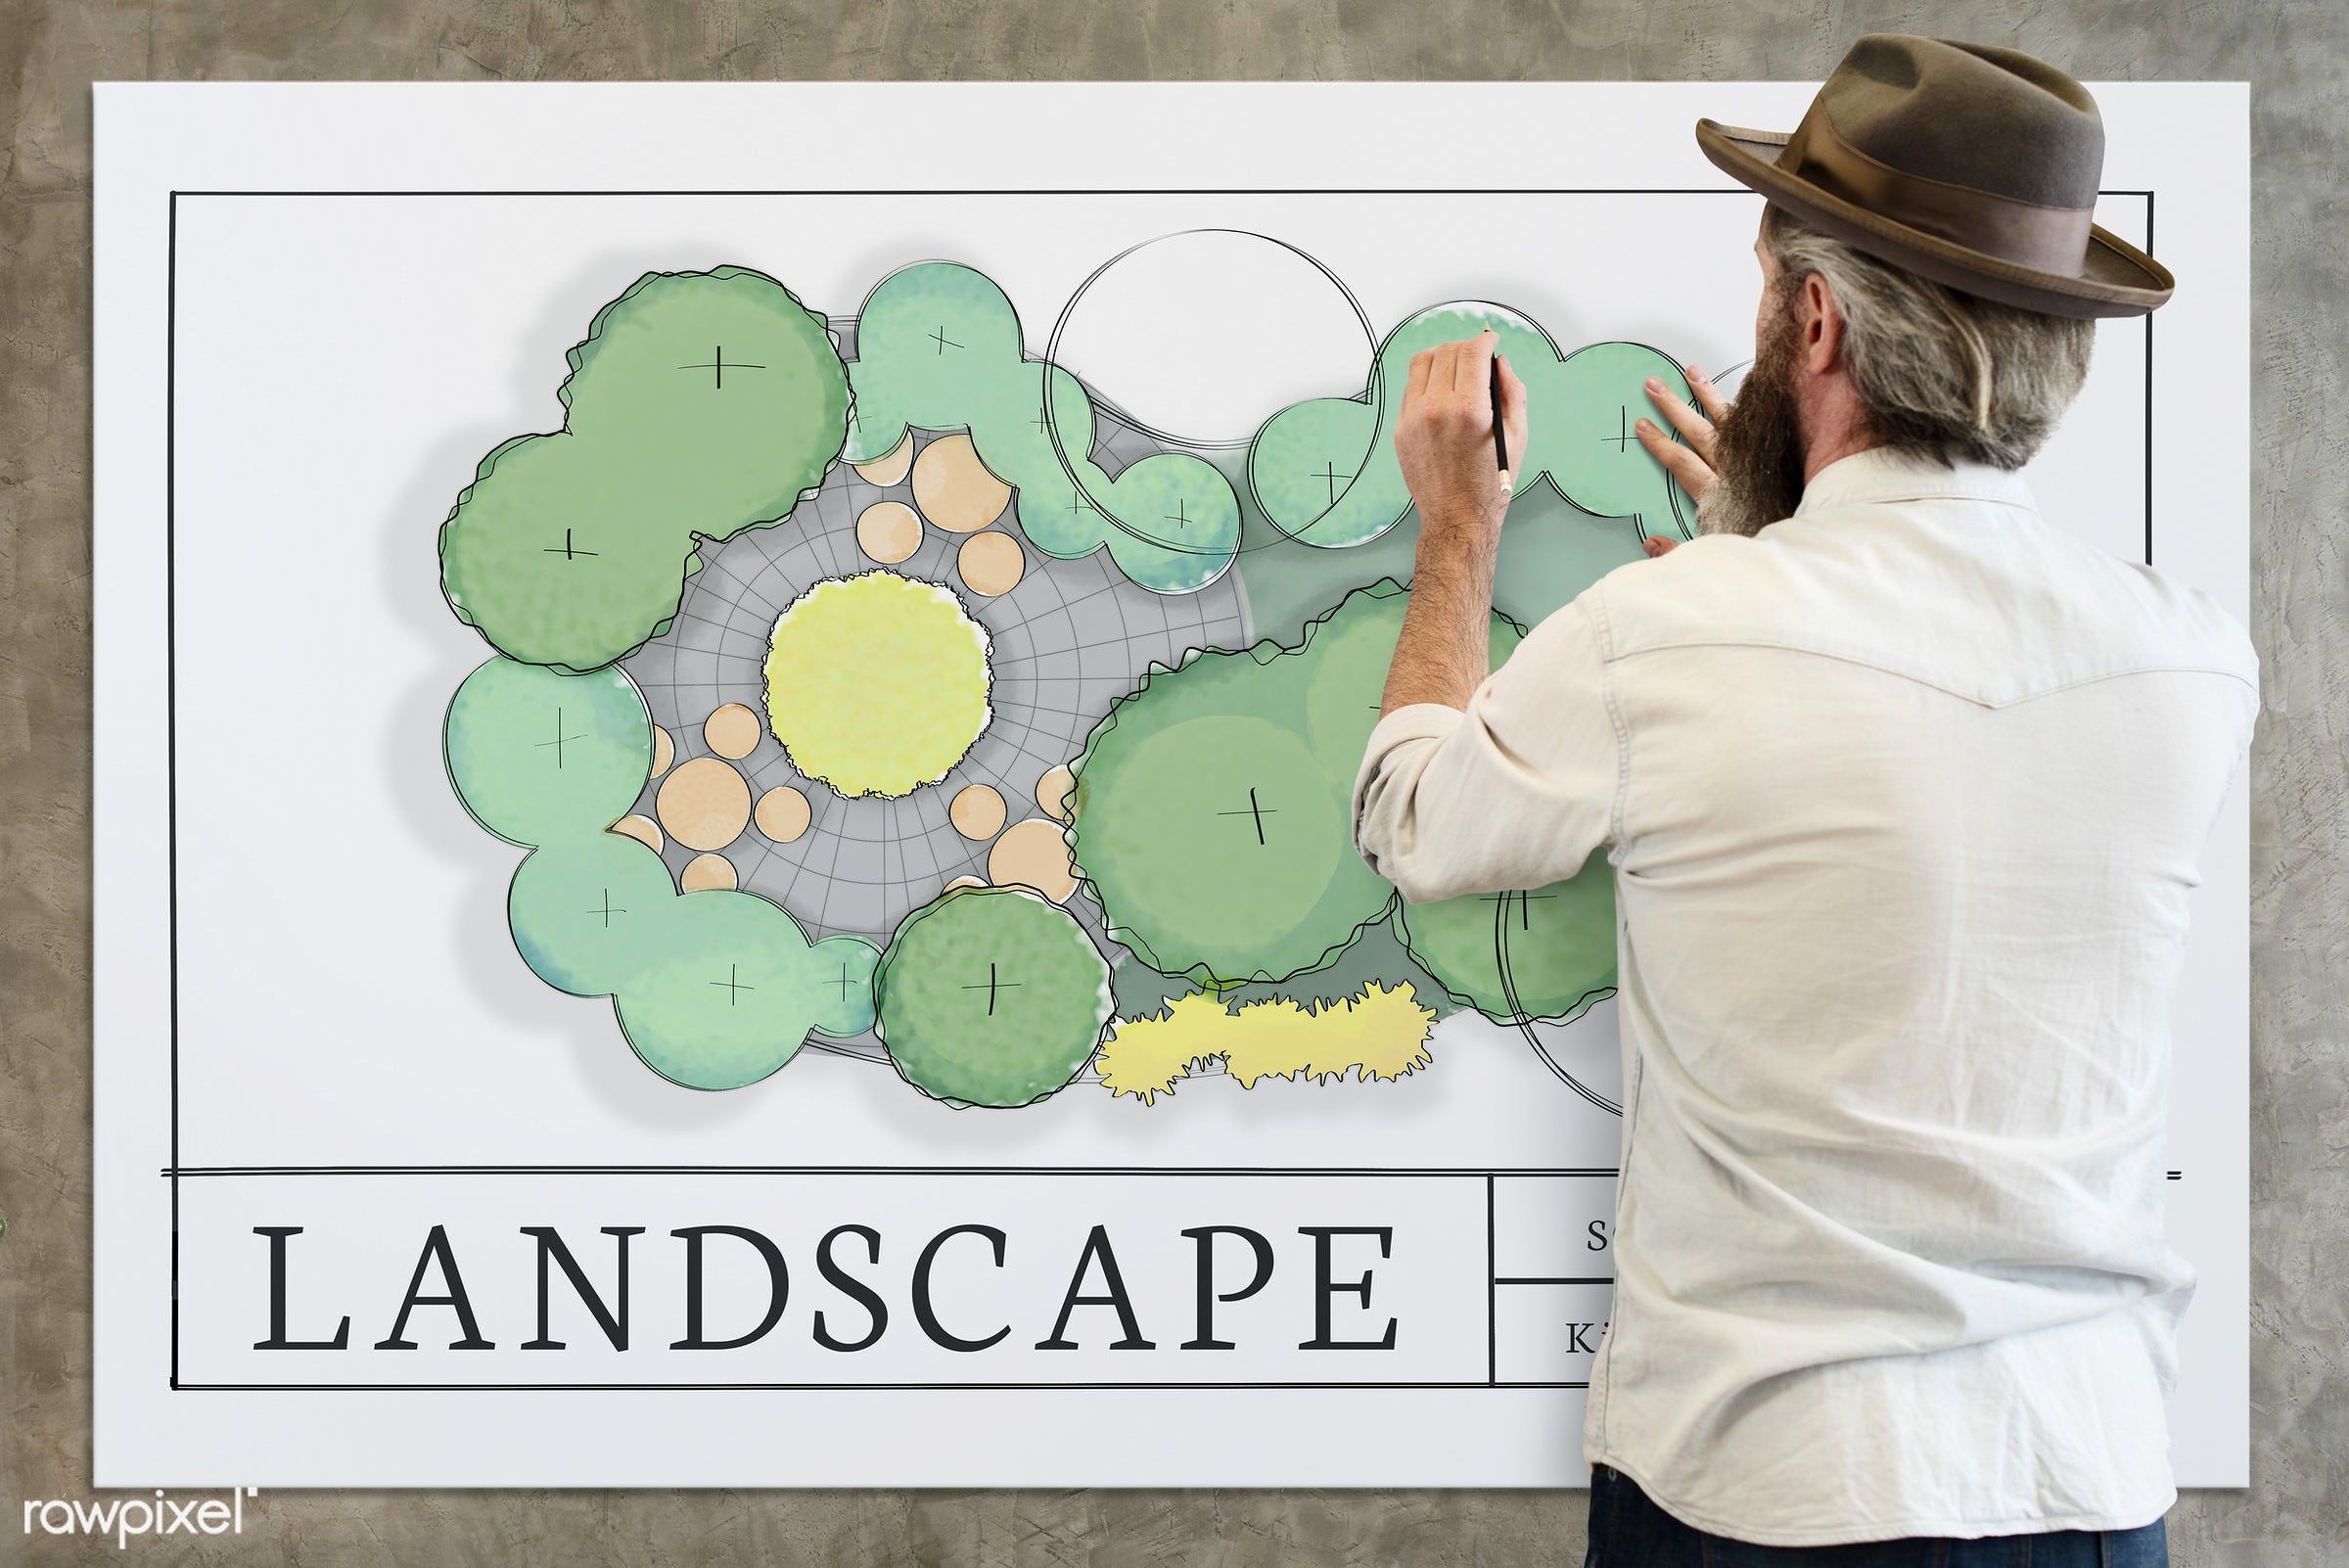 Landscape - adult, alone, architect, architecture, art, back, be creative, beard, beard guy, blueprint, board, carefree,...